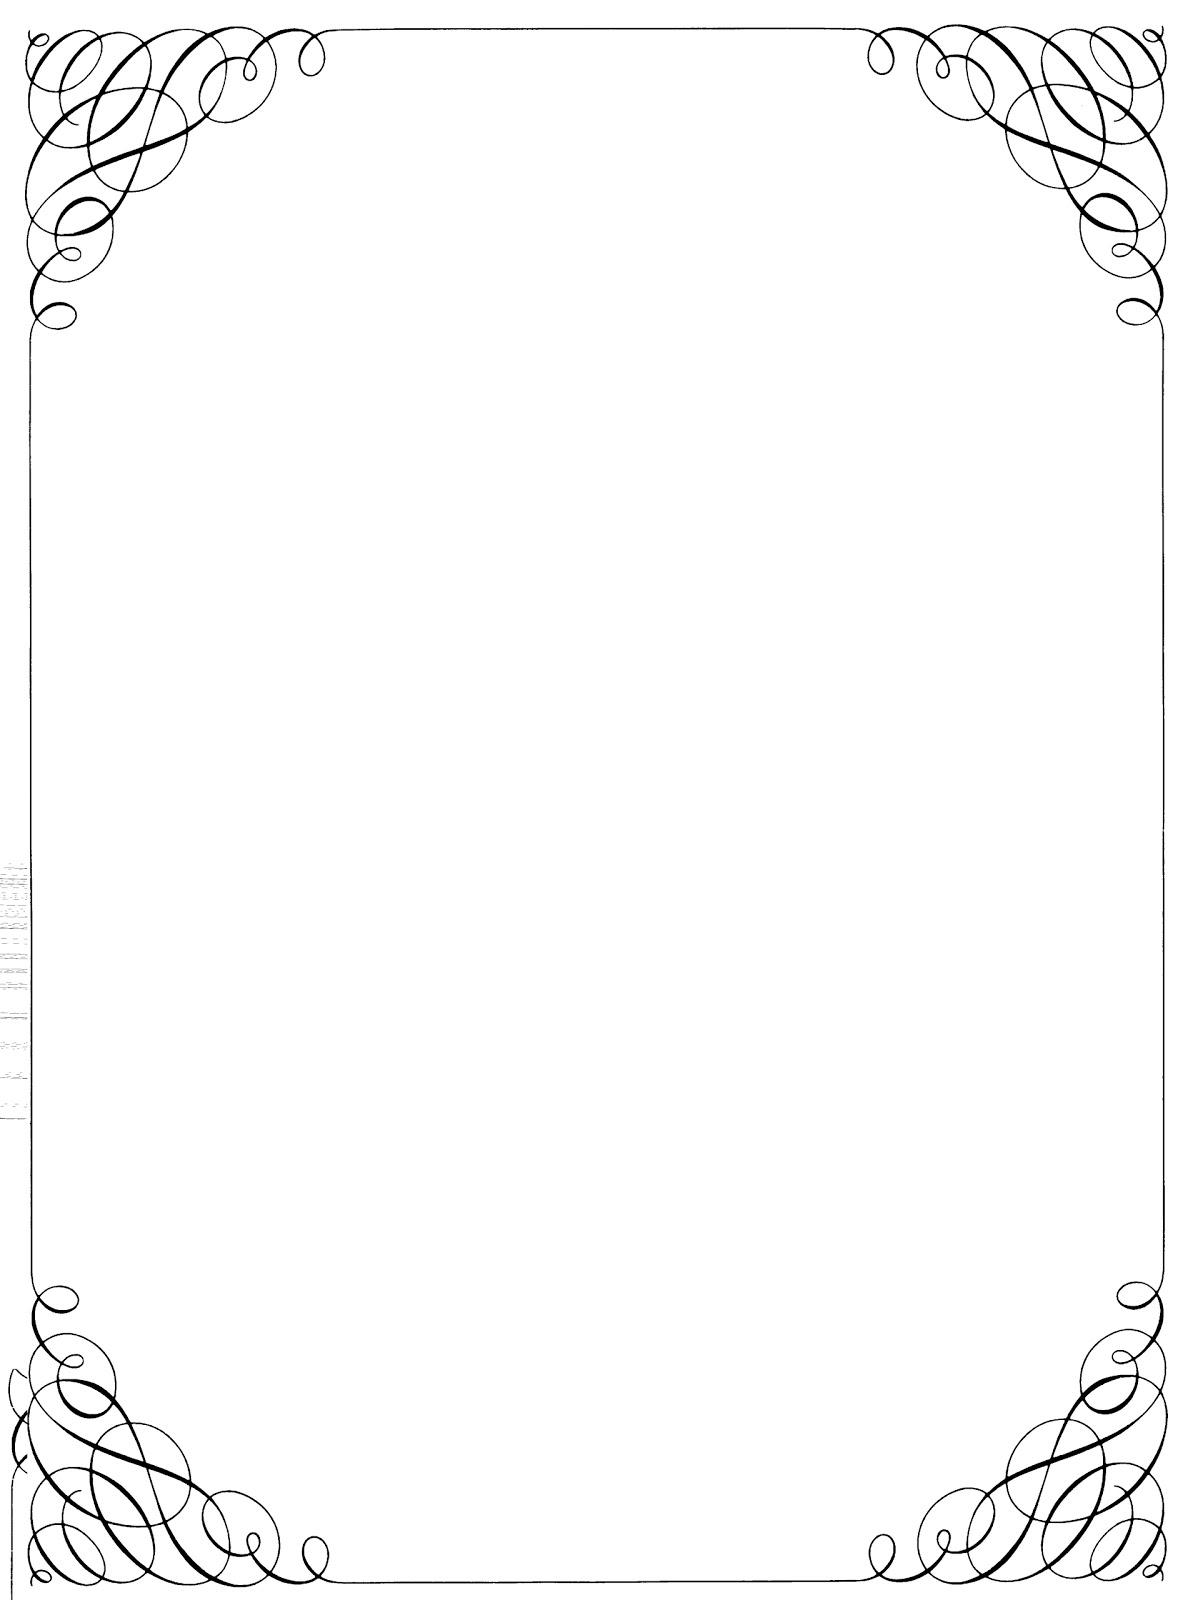 clip art borders frames download - photo #9